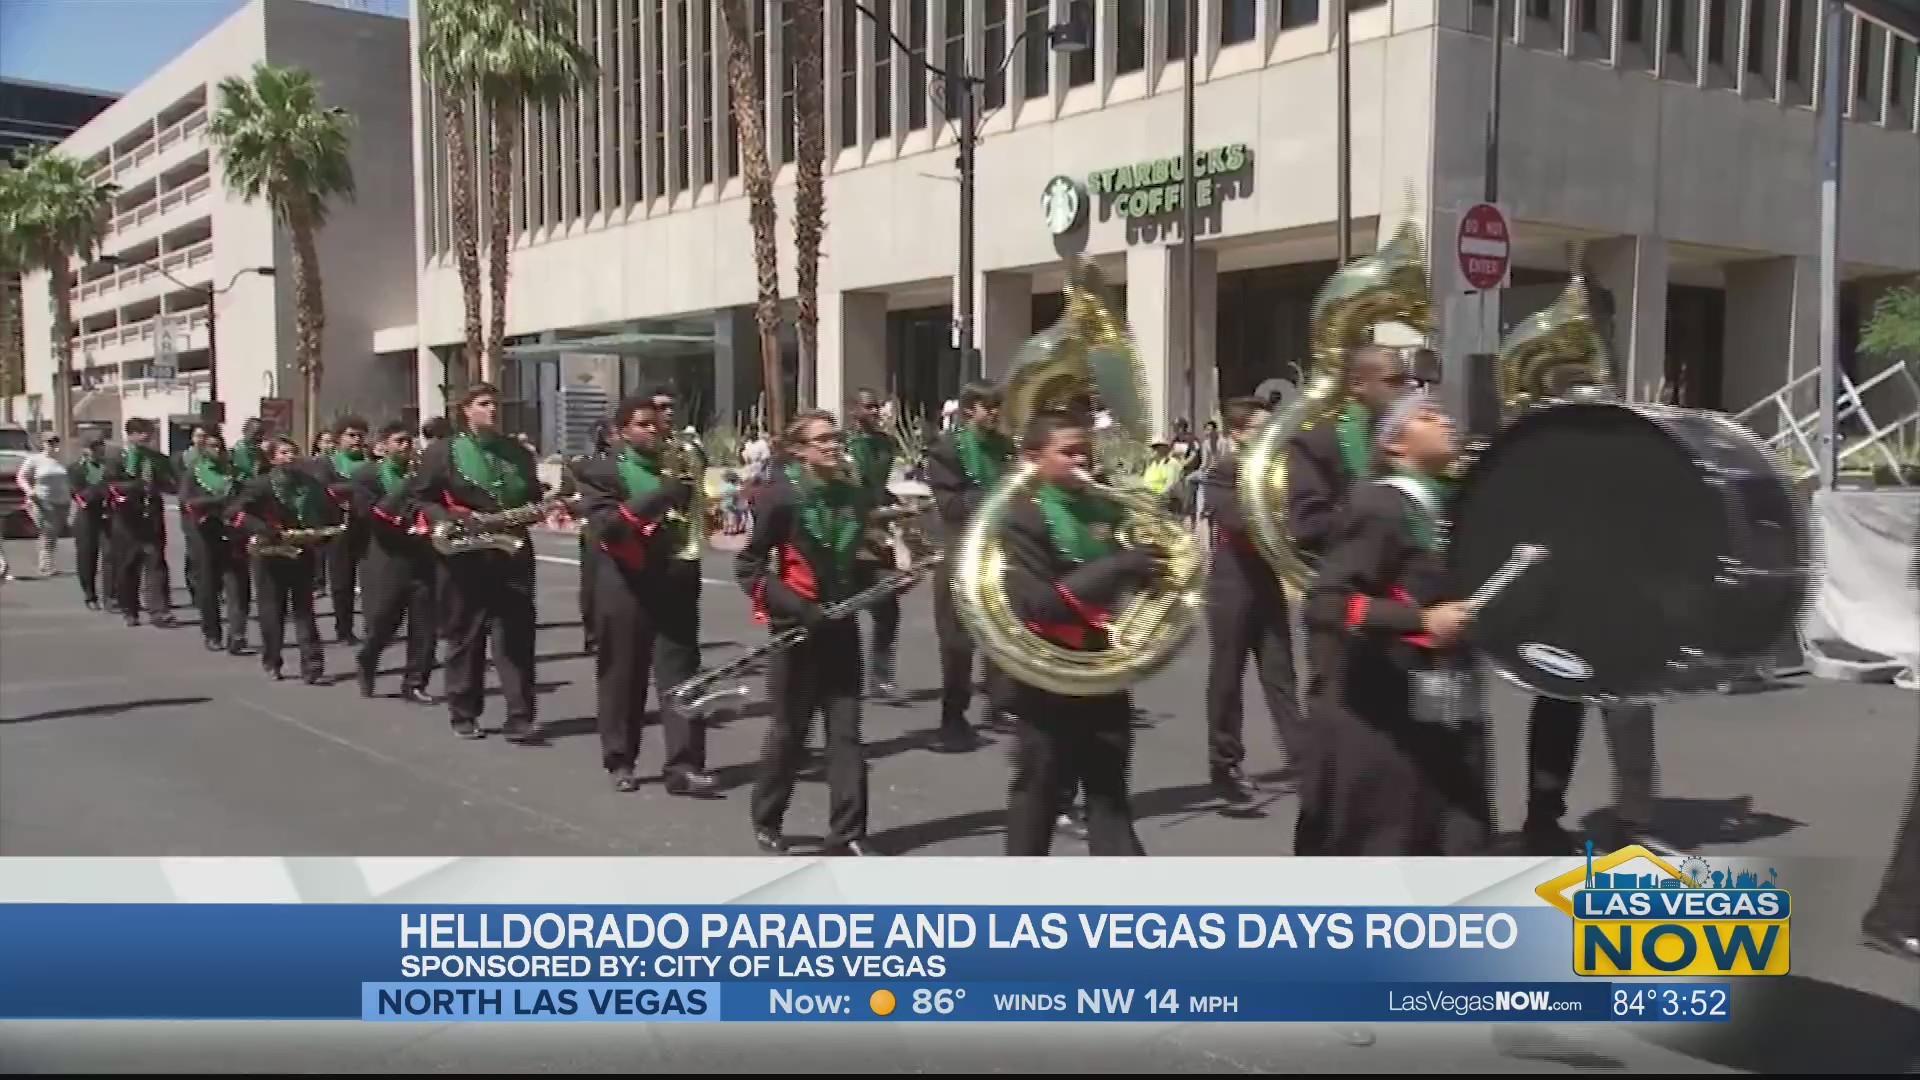 Helldorado Parade and Las Vegas Rodeo Days Rodeo are back